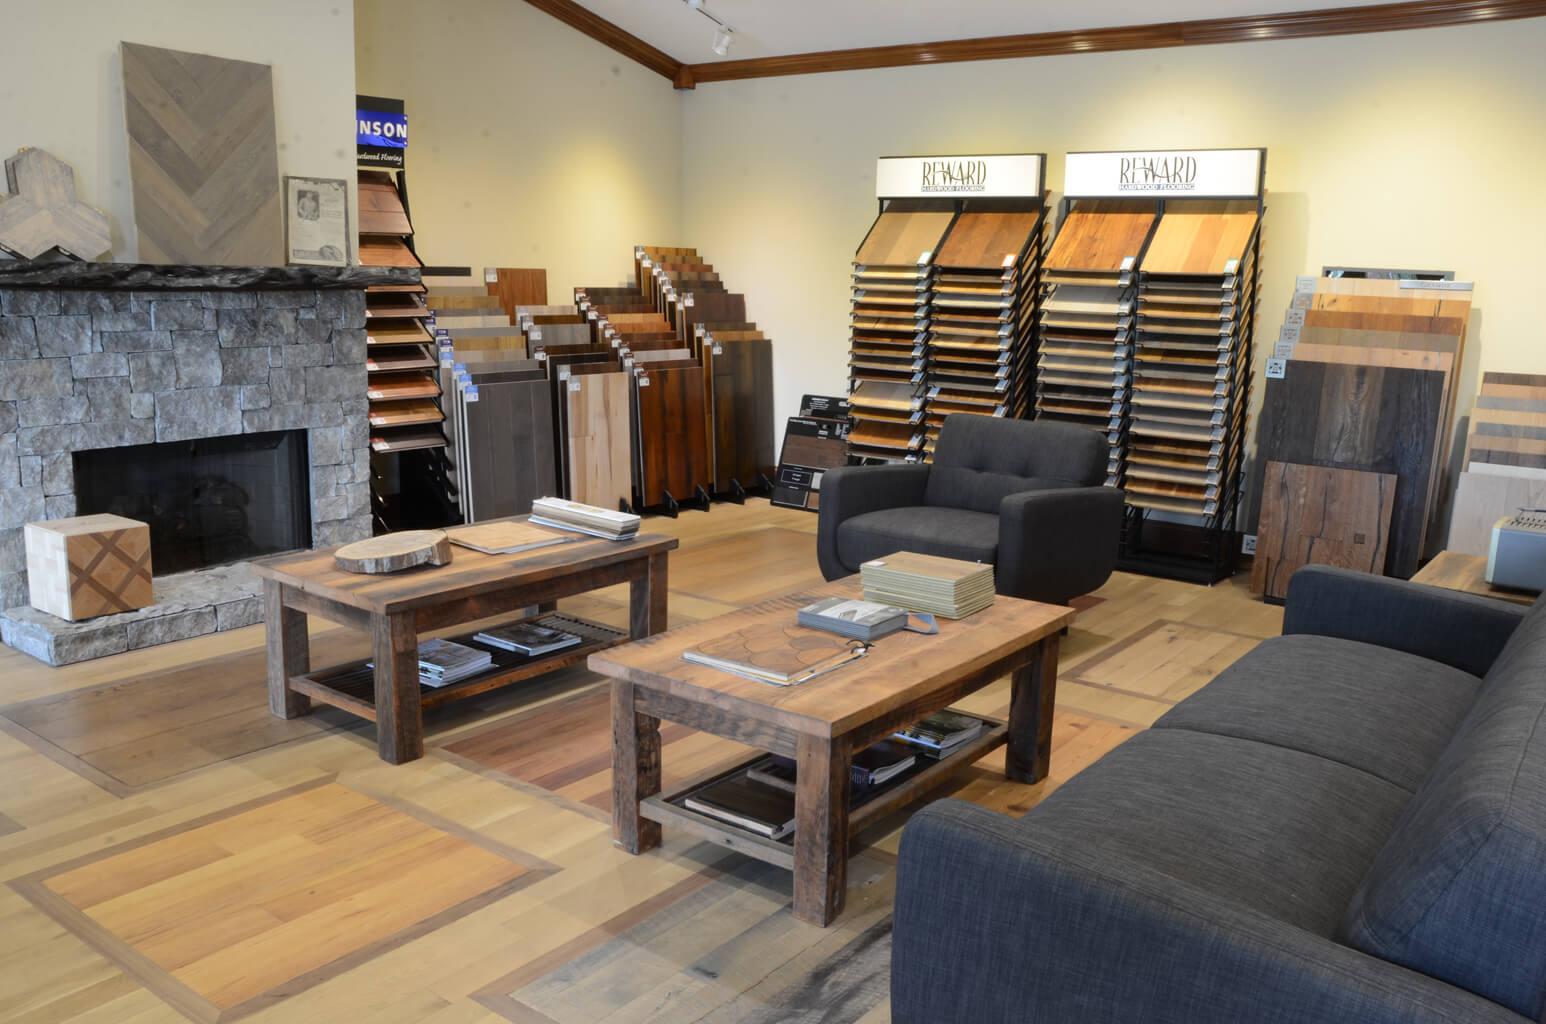 jeffco flooring   supply inc 07 - Jeffco Flooring